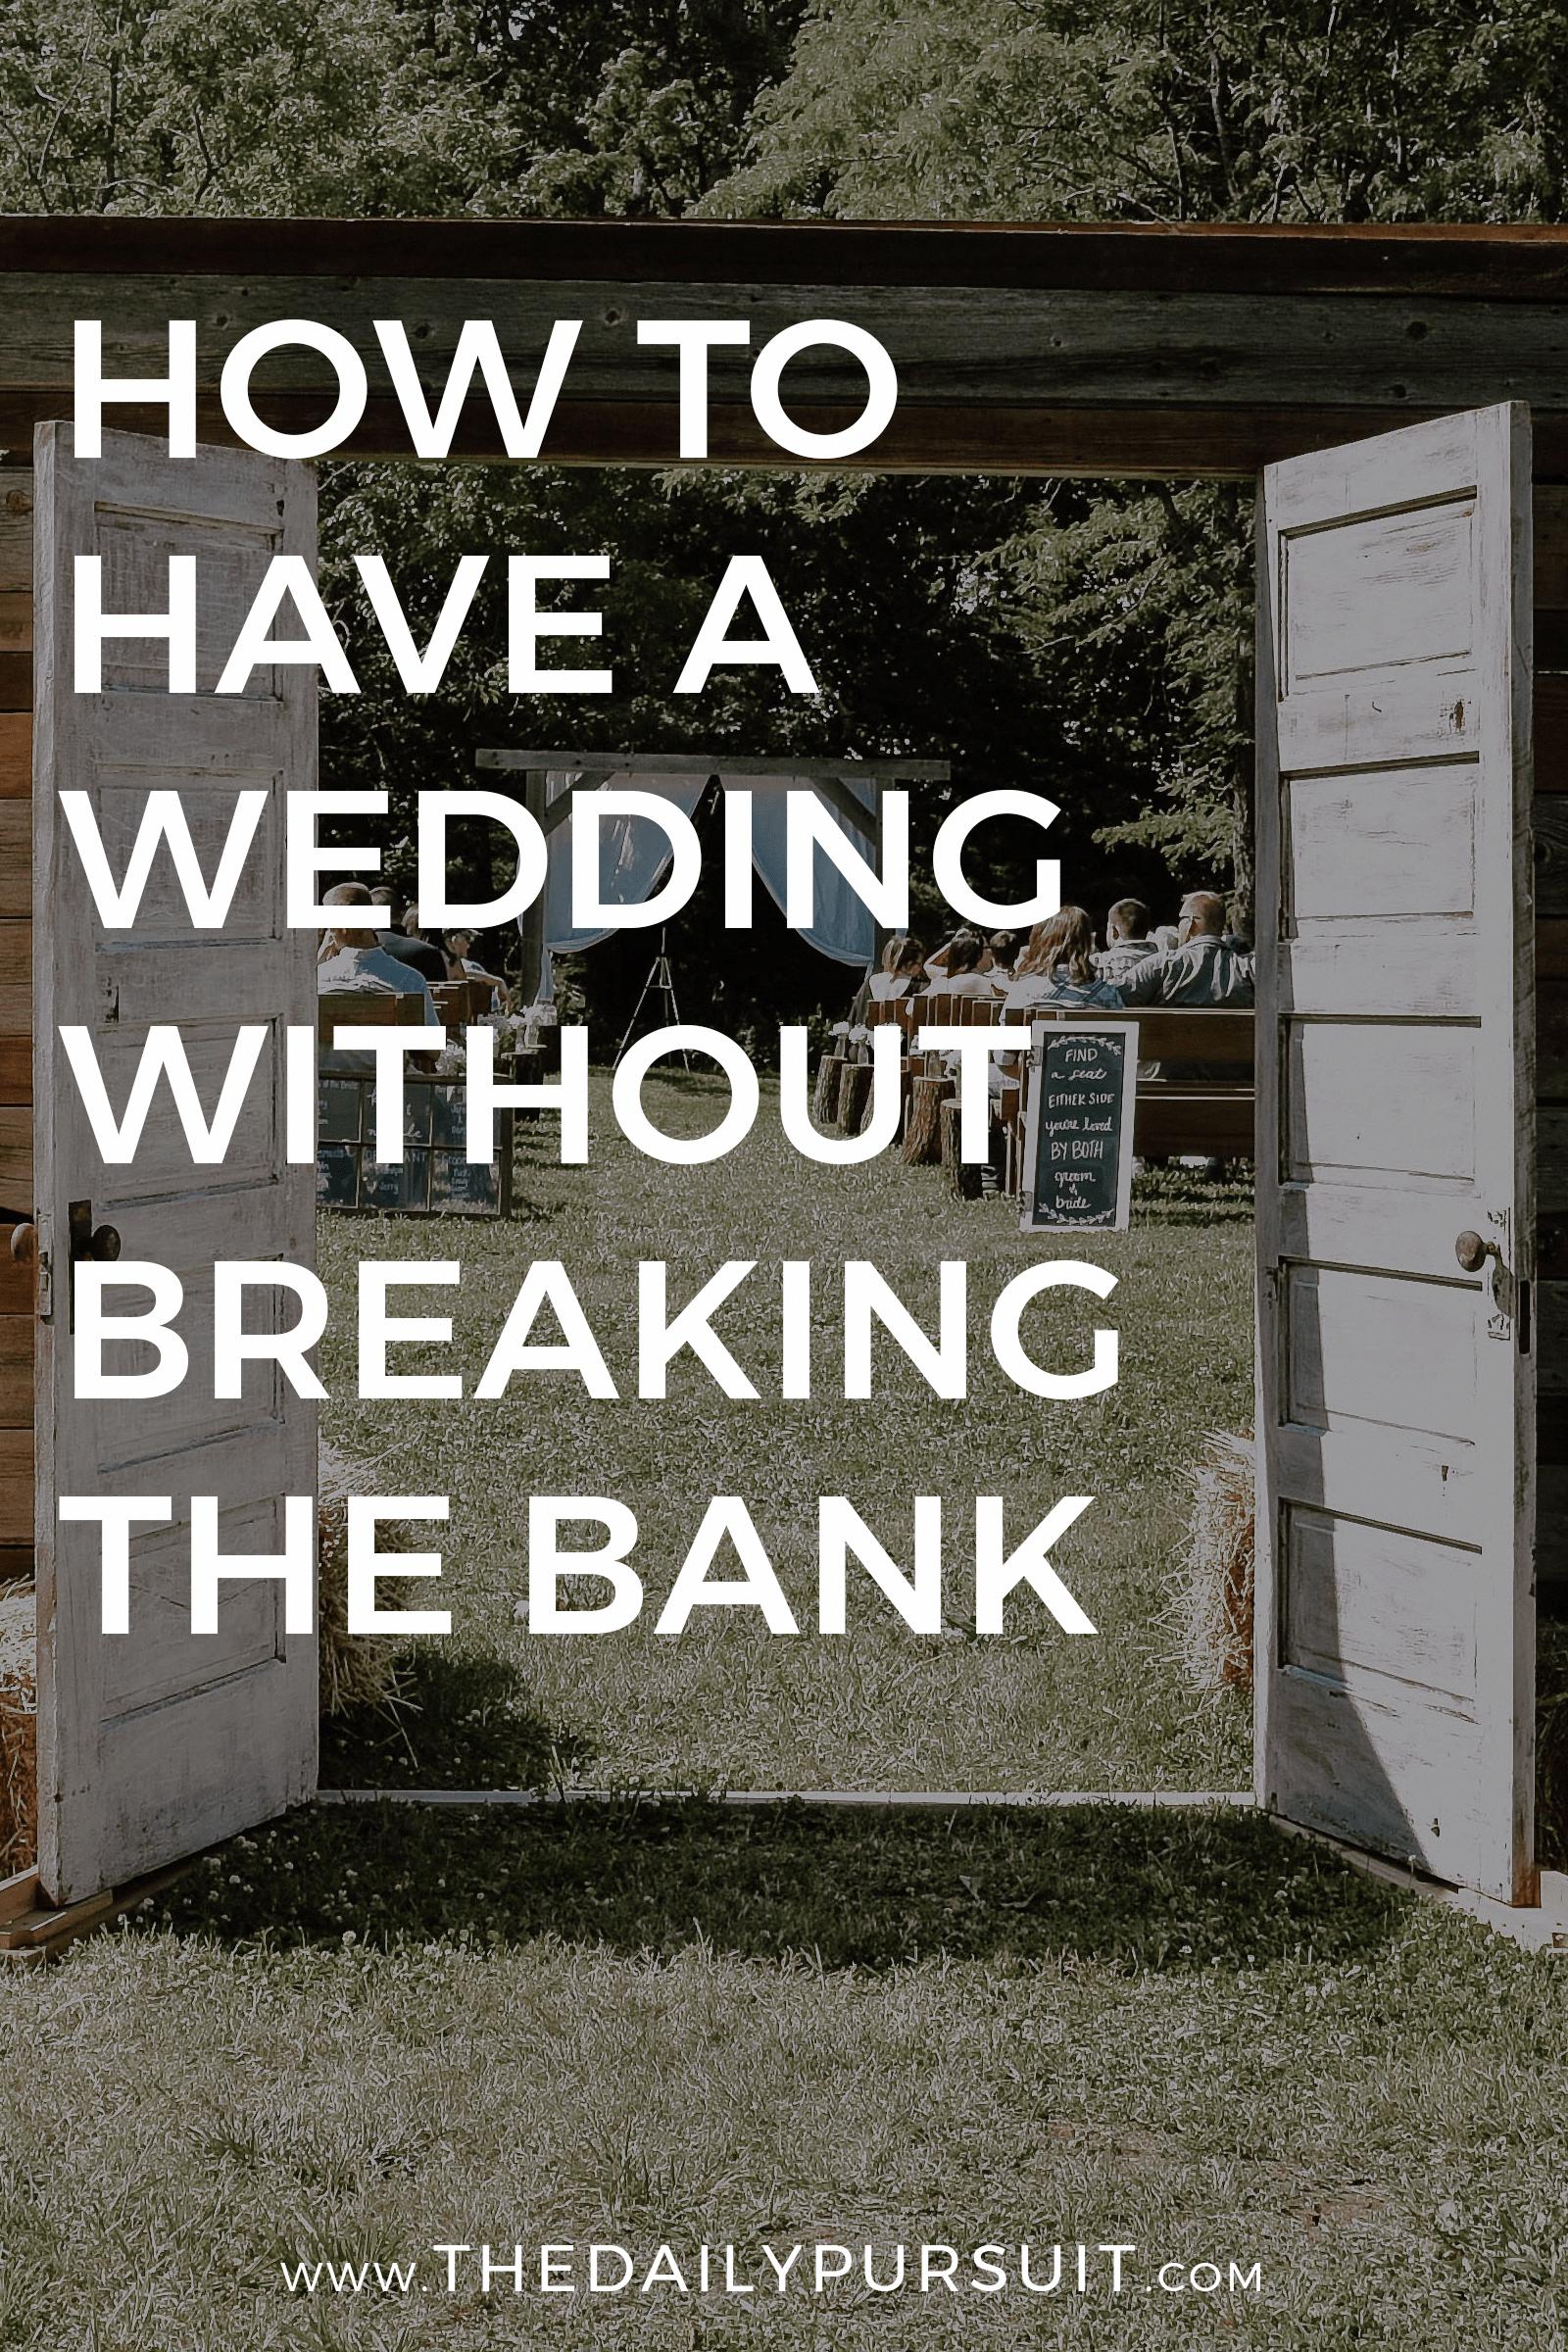 wedding ideas on a budget that is fine.